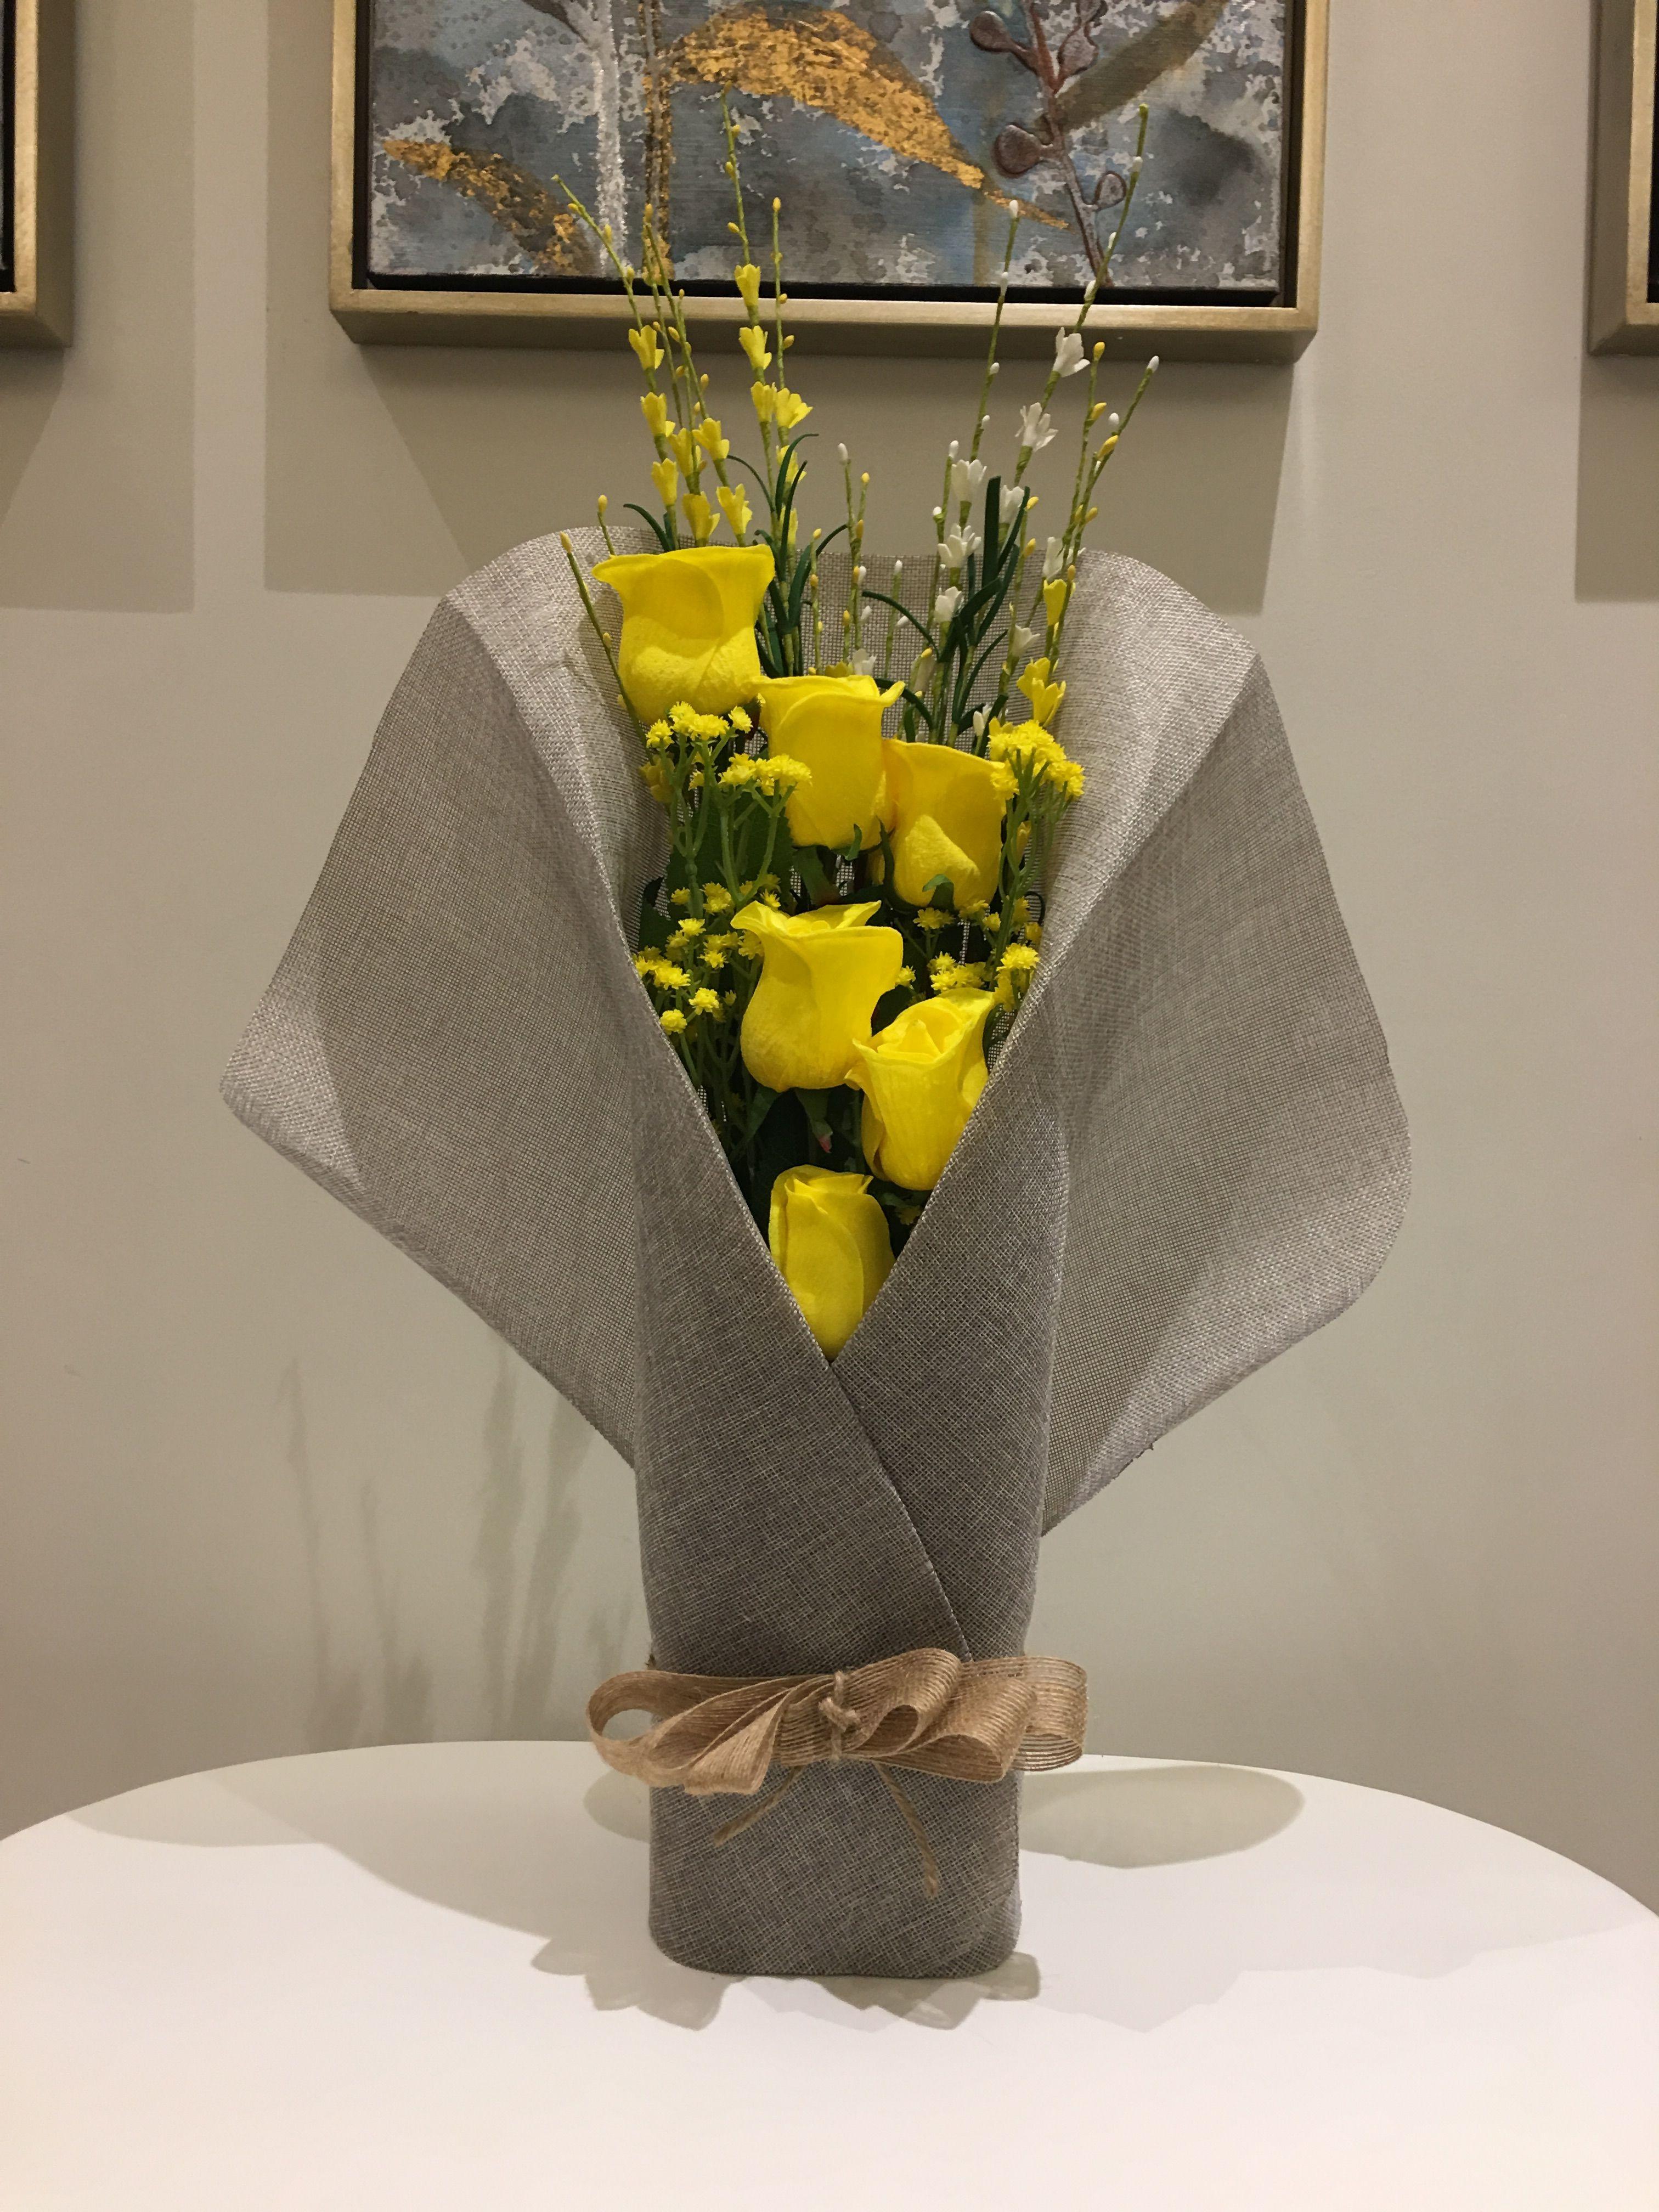 Dailyroses ورد ورد صناعي ورد طبيعي بوكيه ورد فازات فازات ورد تنسيق ورد خشبيات بالونات بالونات هيليوم محل ورد تخرج حفلات Rose Flowers Home Decor